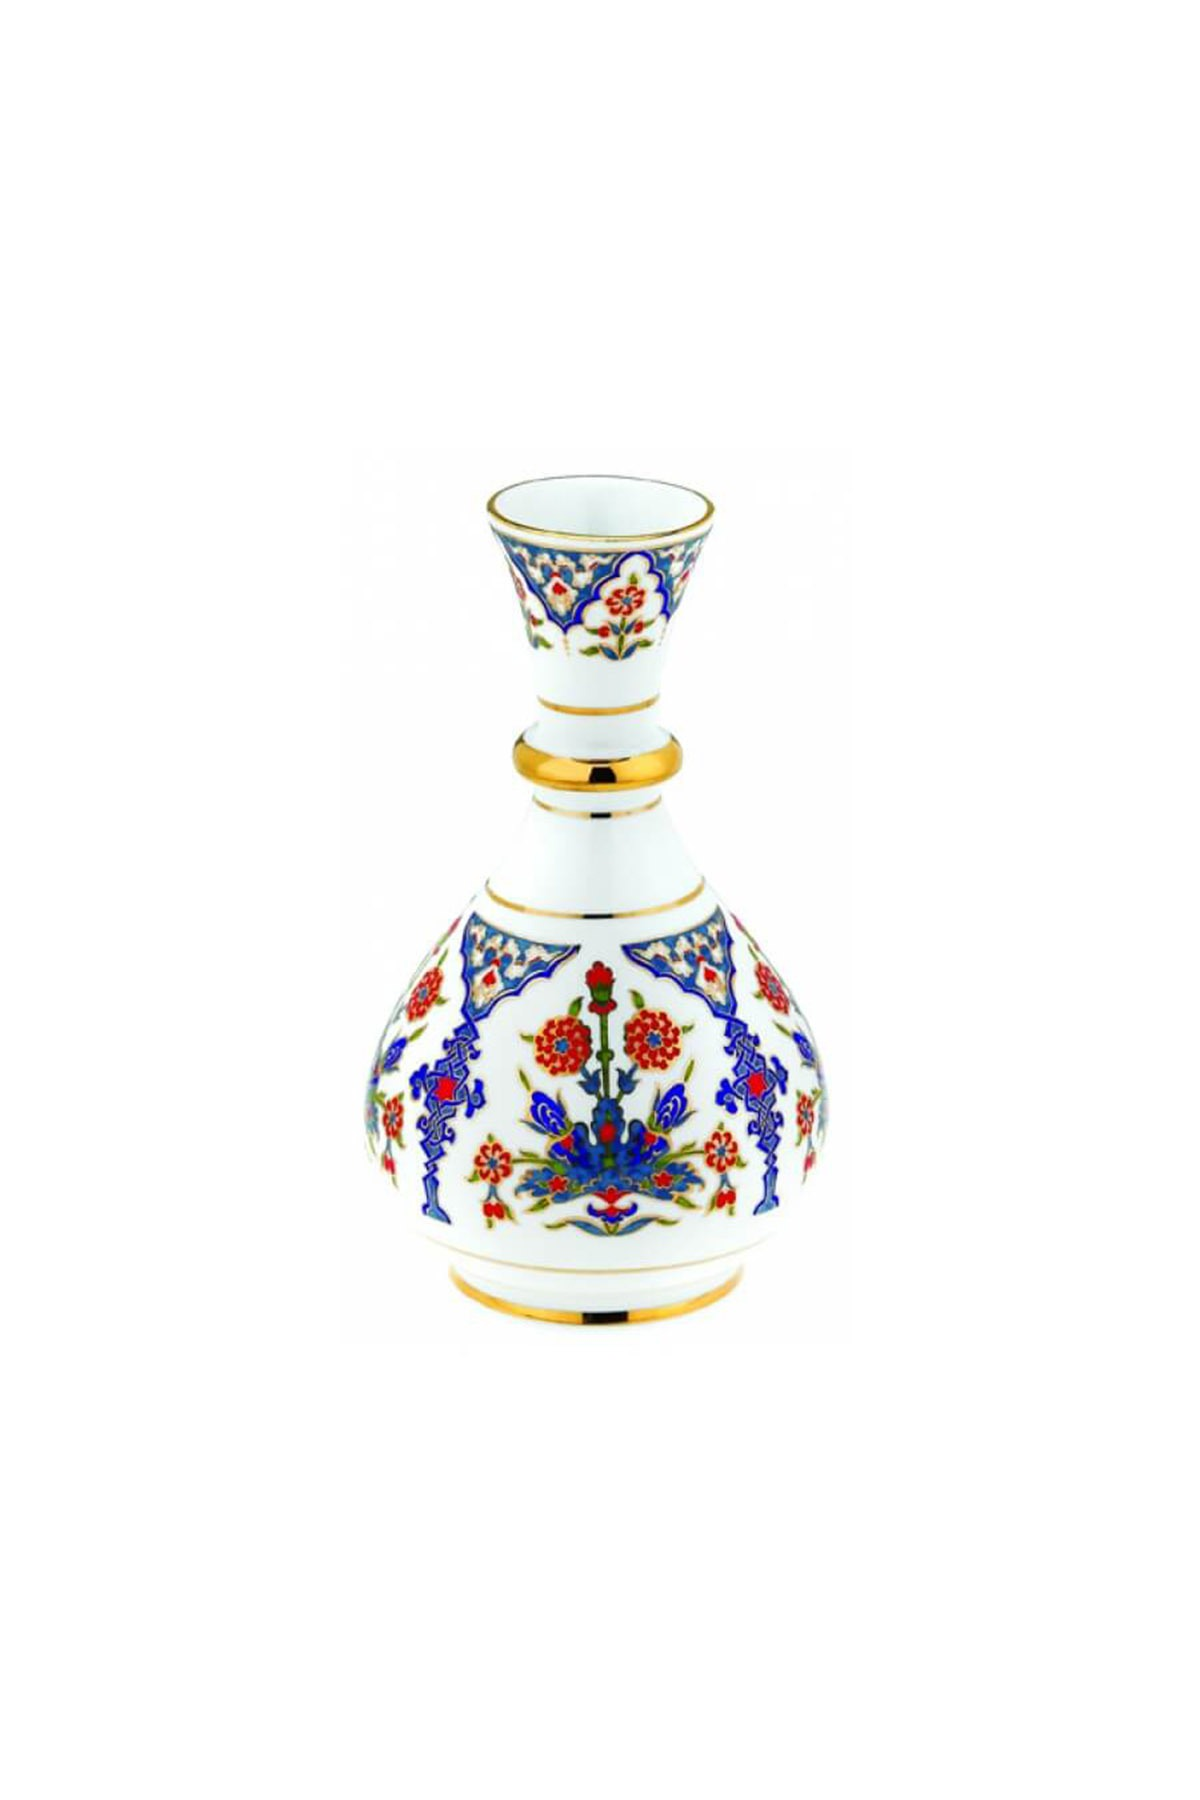 Kütahya Porselen - Kütahya Porselen 20 Cm Haliç Vazo Dekor No:422